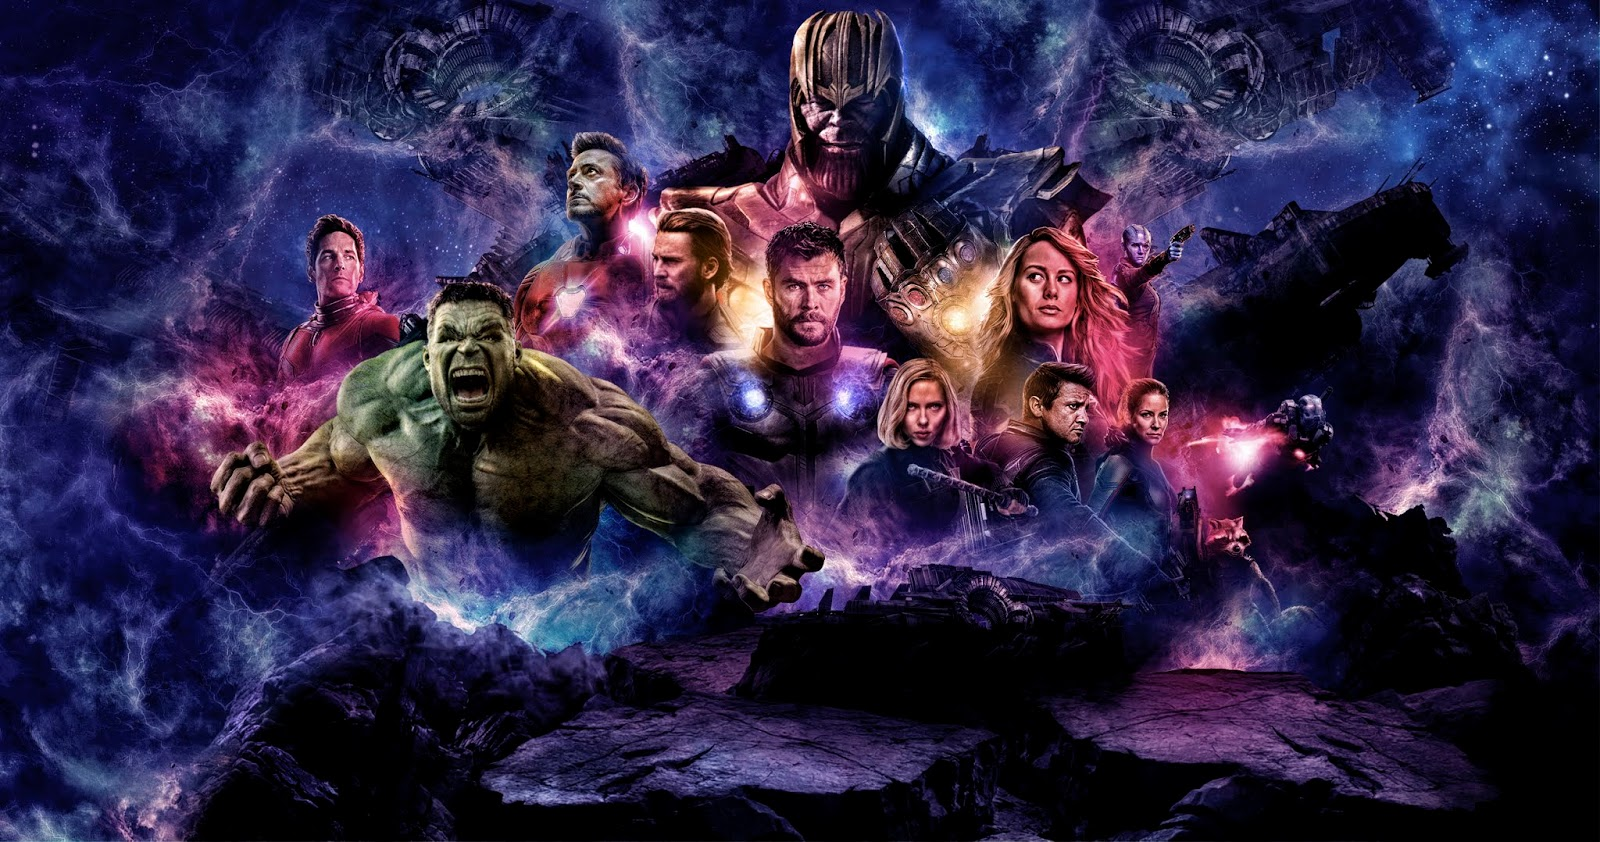 27 Avengers Endgame Wallpapers On Wallpapersafari